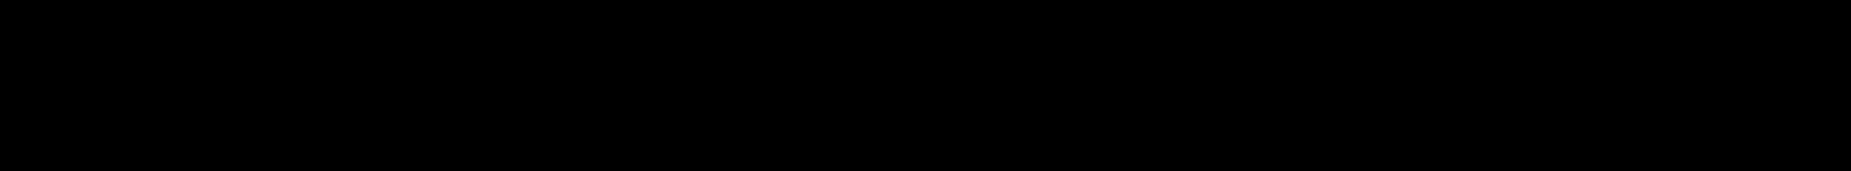 Joystick Font Pixel Sagas Fontspace